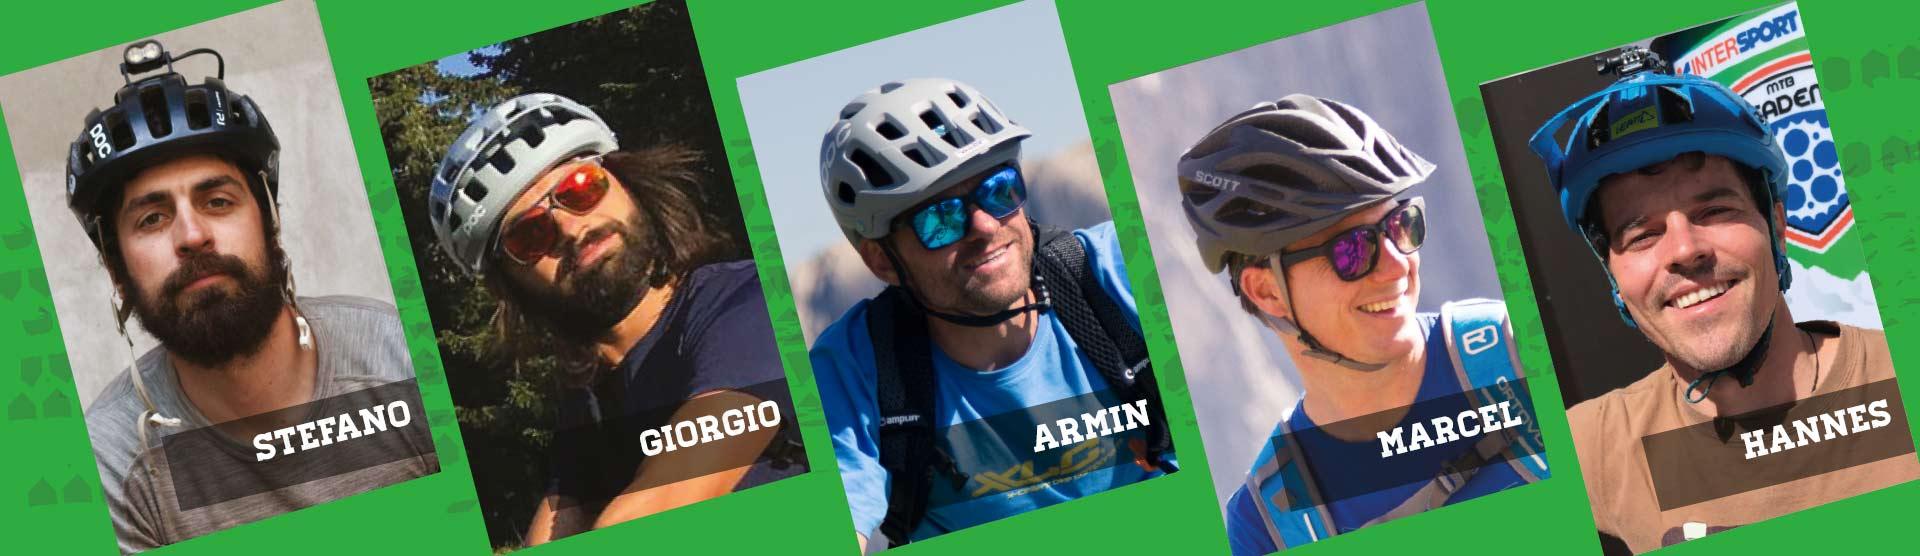 Bike guide - bike instructor. Intersport bike academy val gardena